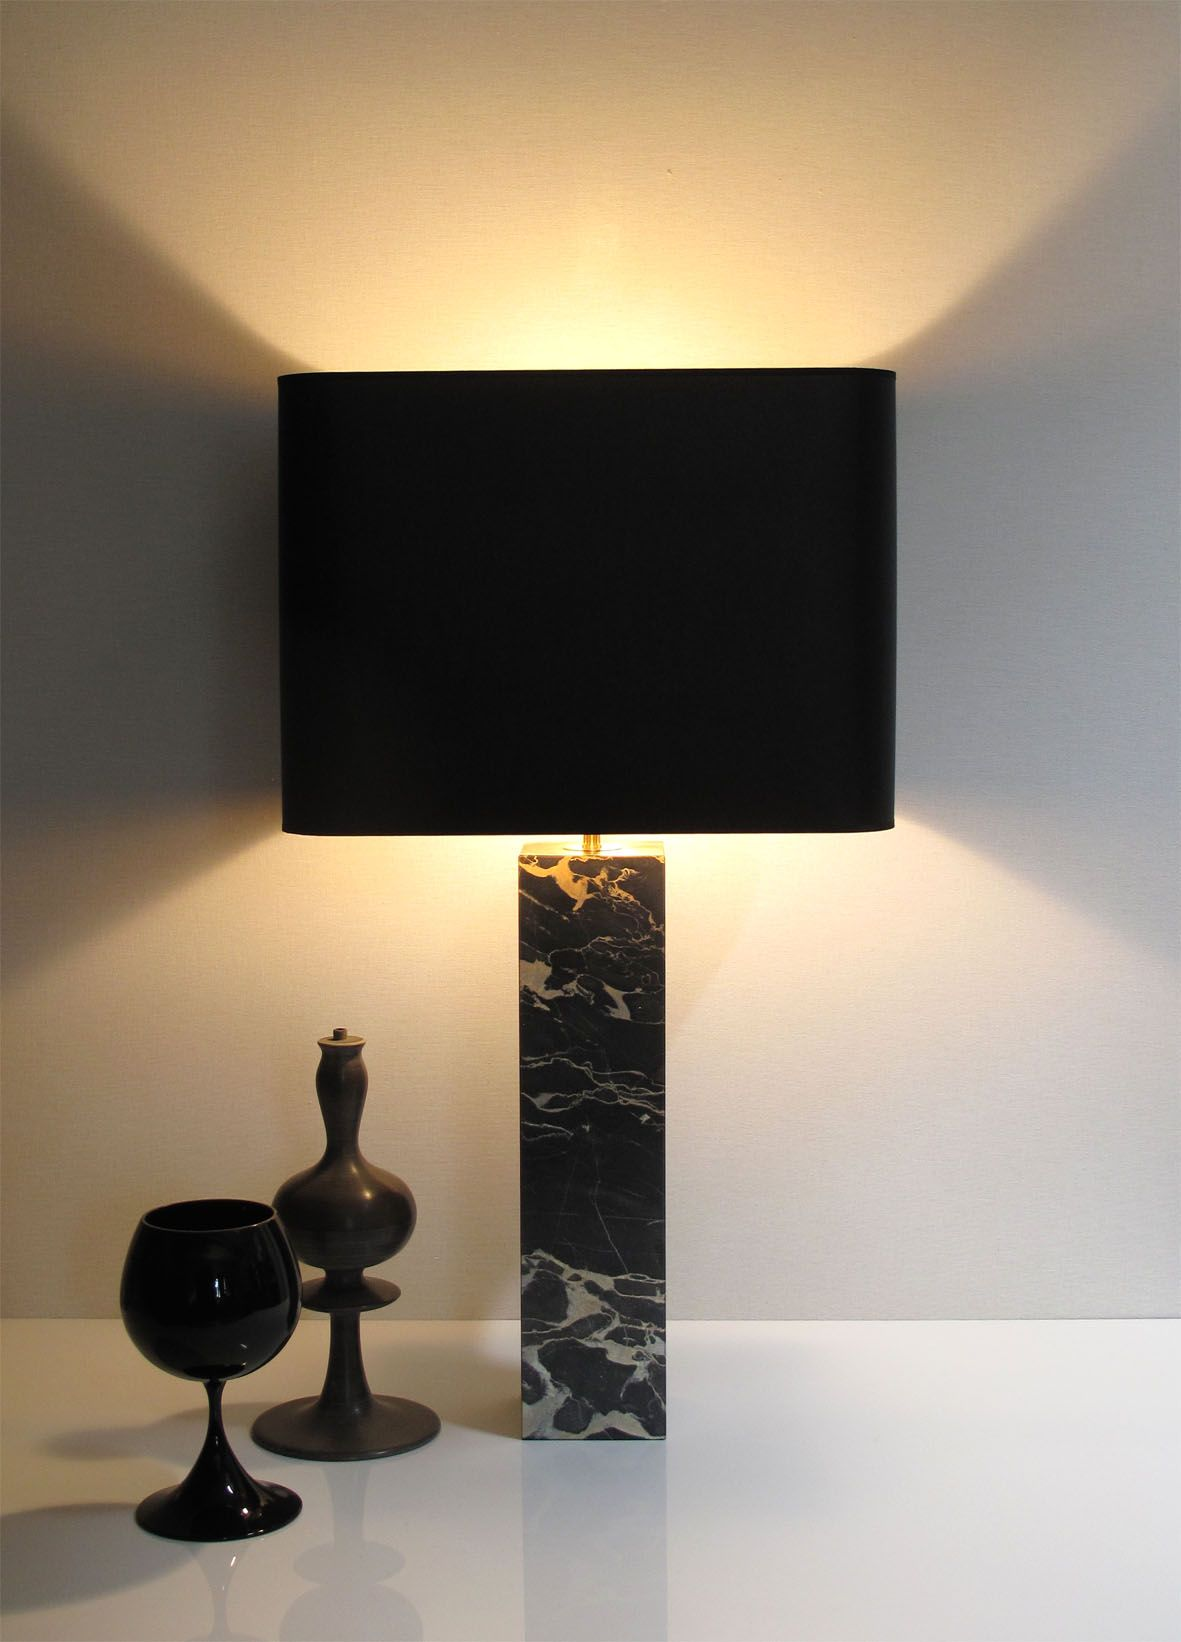 Hera Gm Lampe A Poser Hauteur 68cm Marbre Nero Portoro Abat Jour